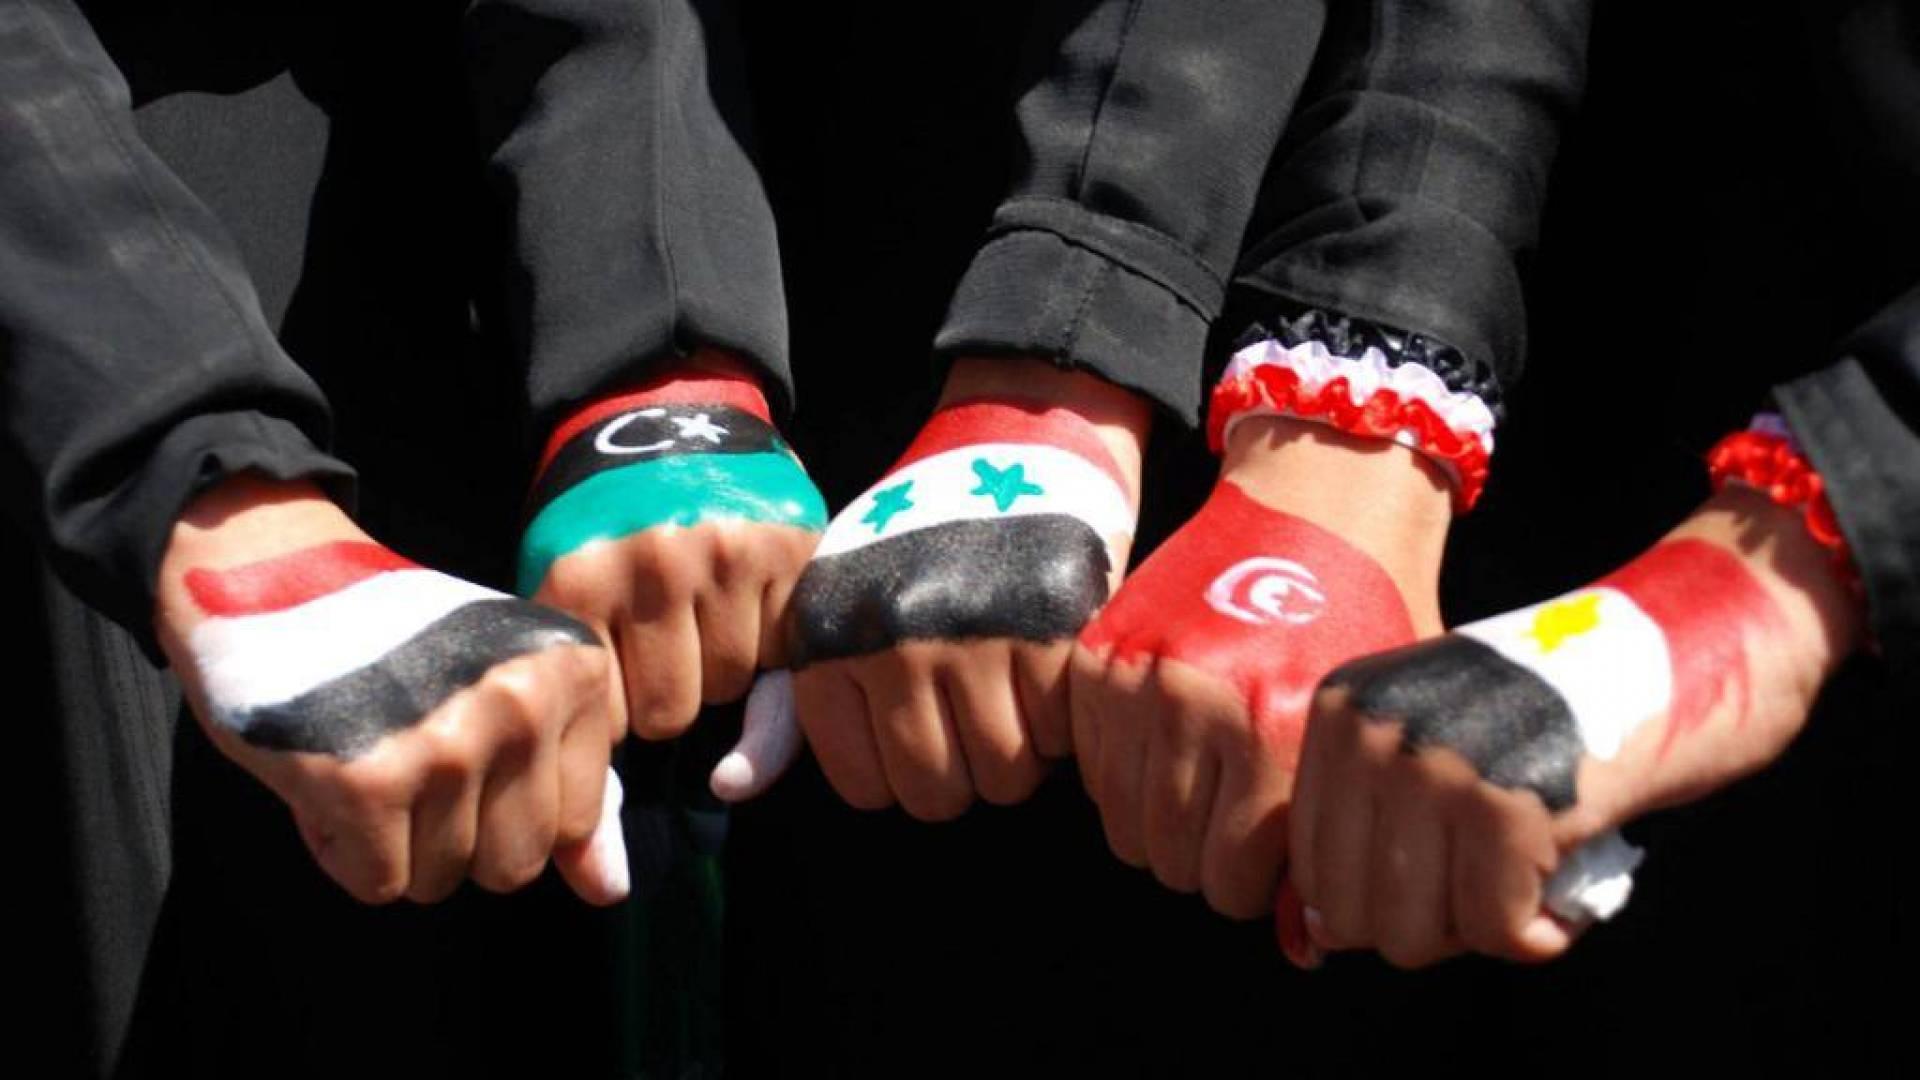 Photo of العدالة الانتقالية في مهب الثورات المُضادة:  مساراتٌ مُجهضة وأخرى لم تكتمل بعدُ!